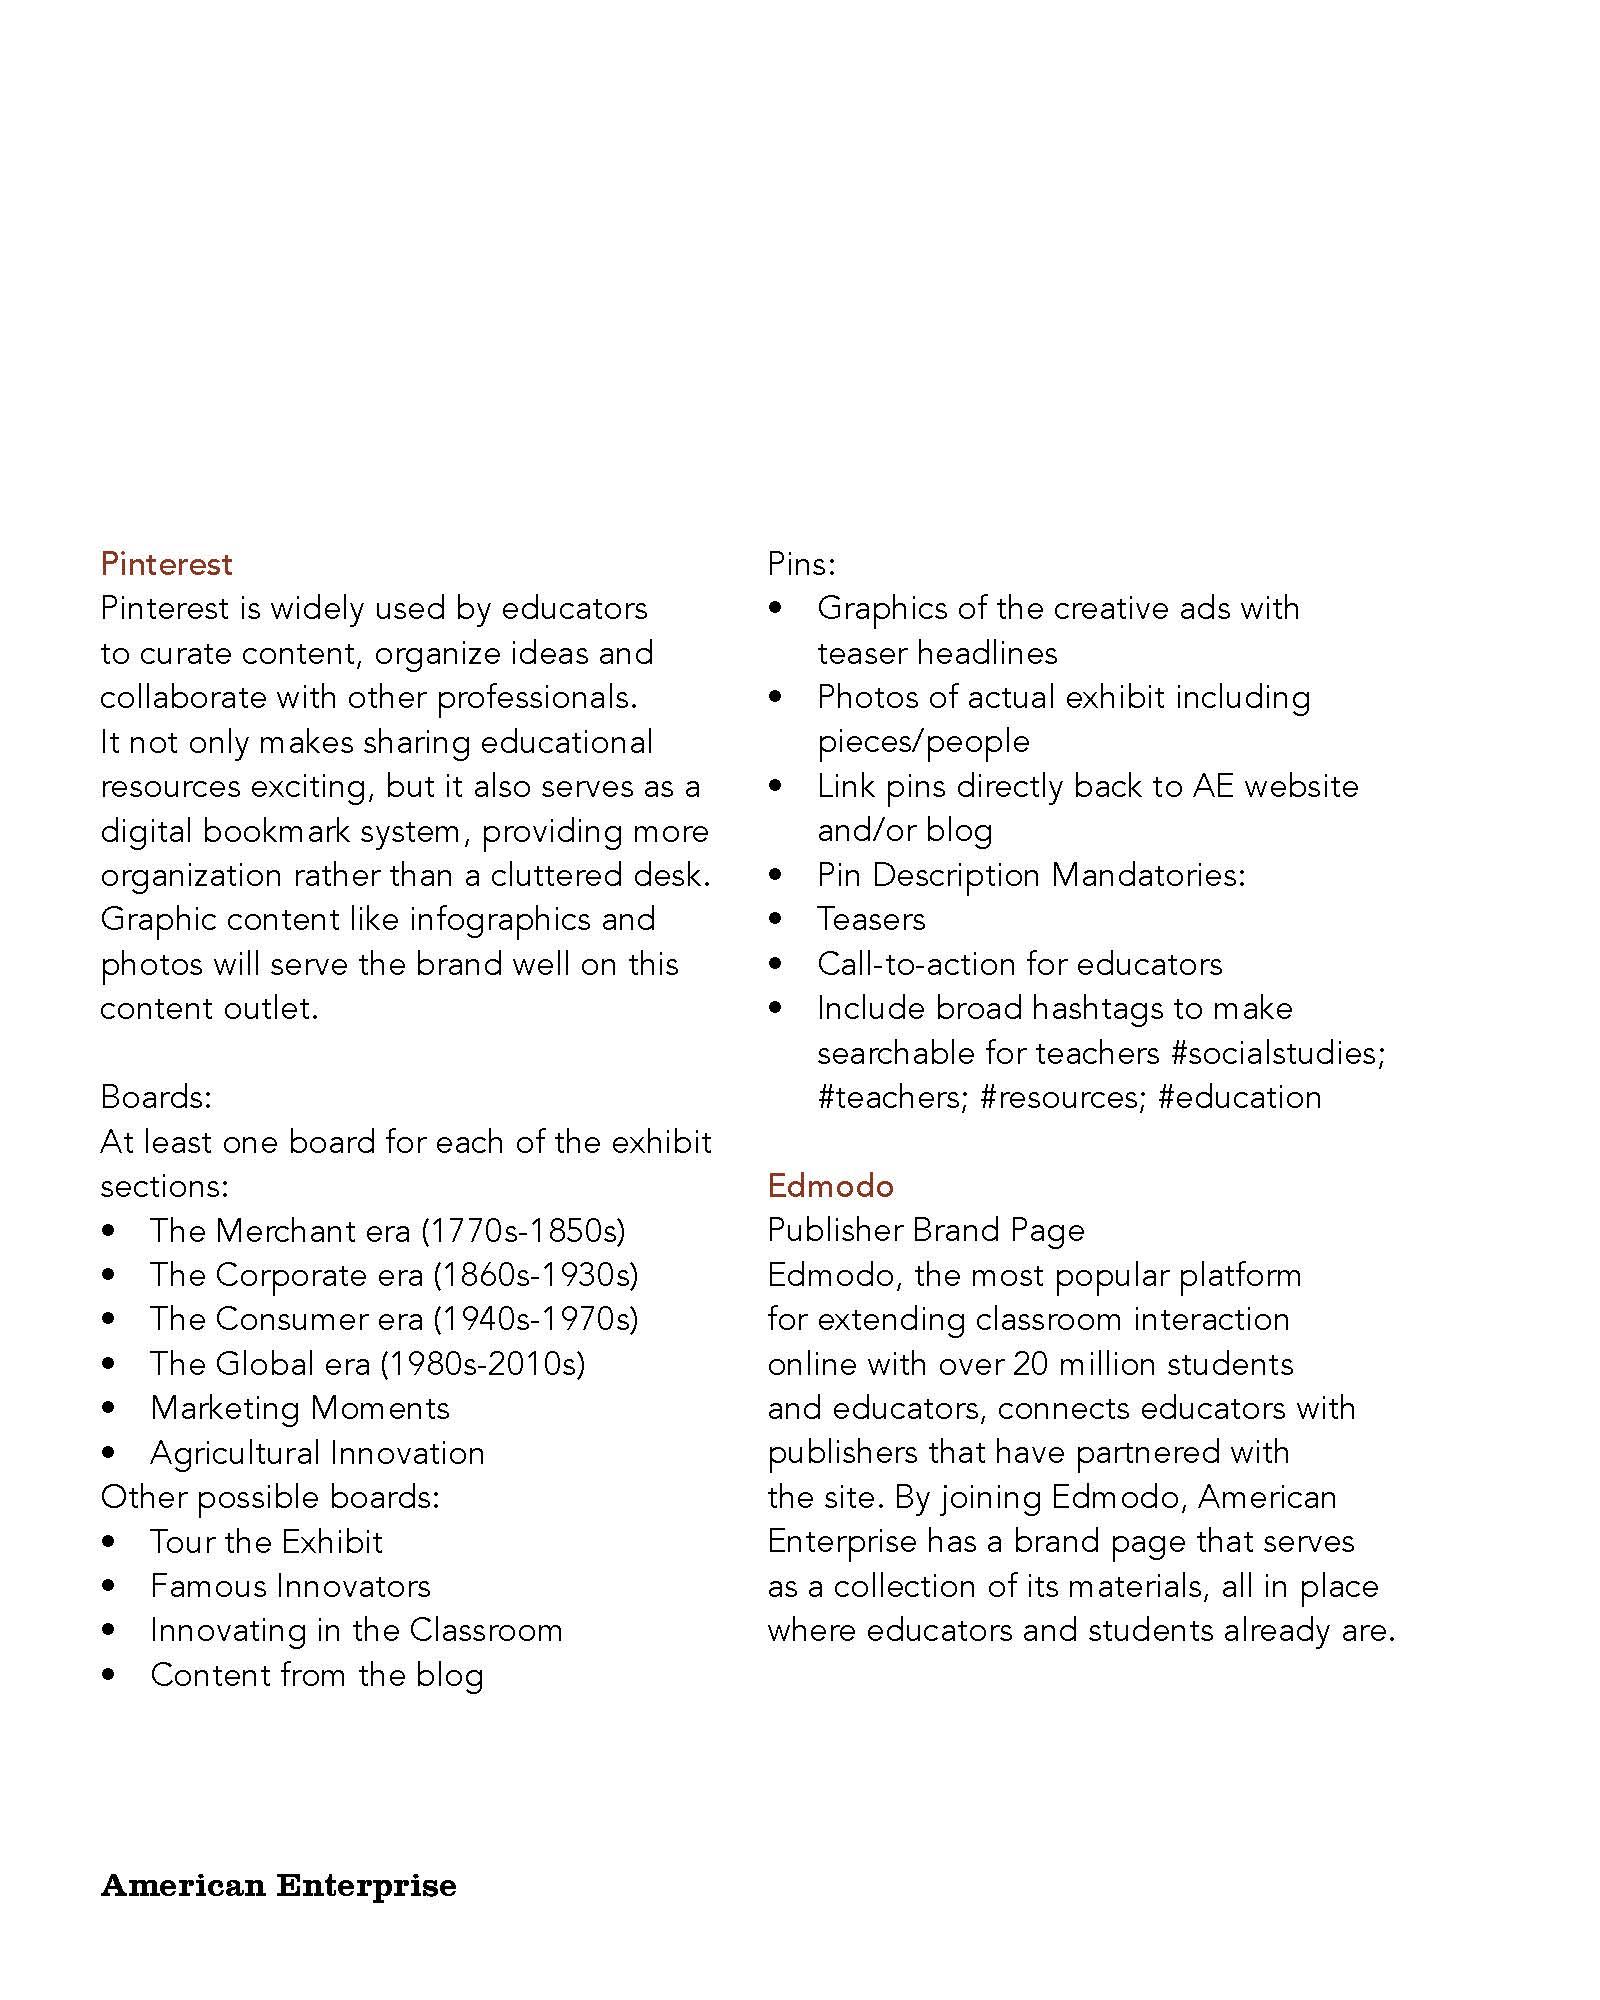 American Enterprise Plans Book%2C 2013%28cut%29_Page_46.jpg